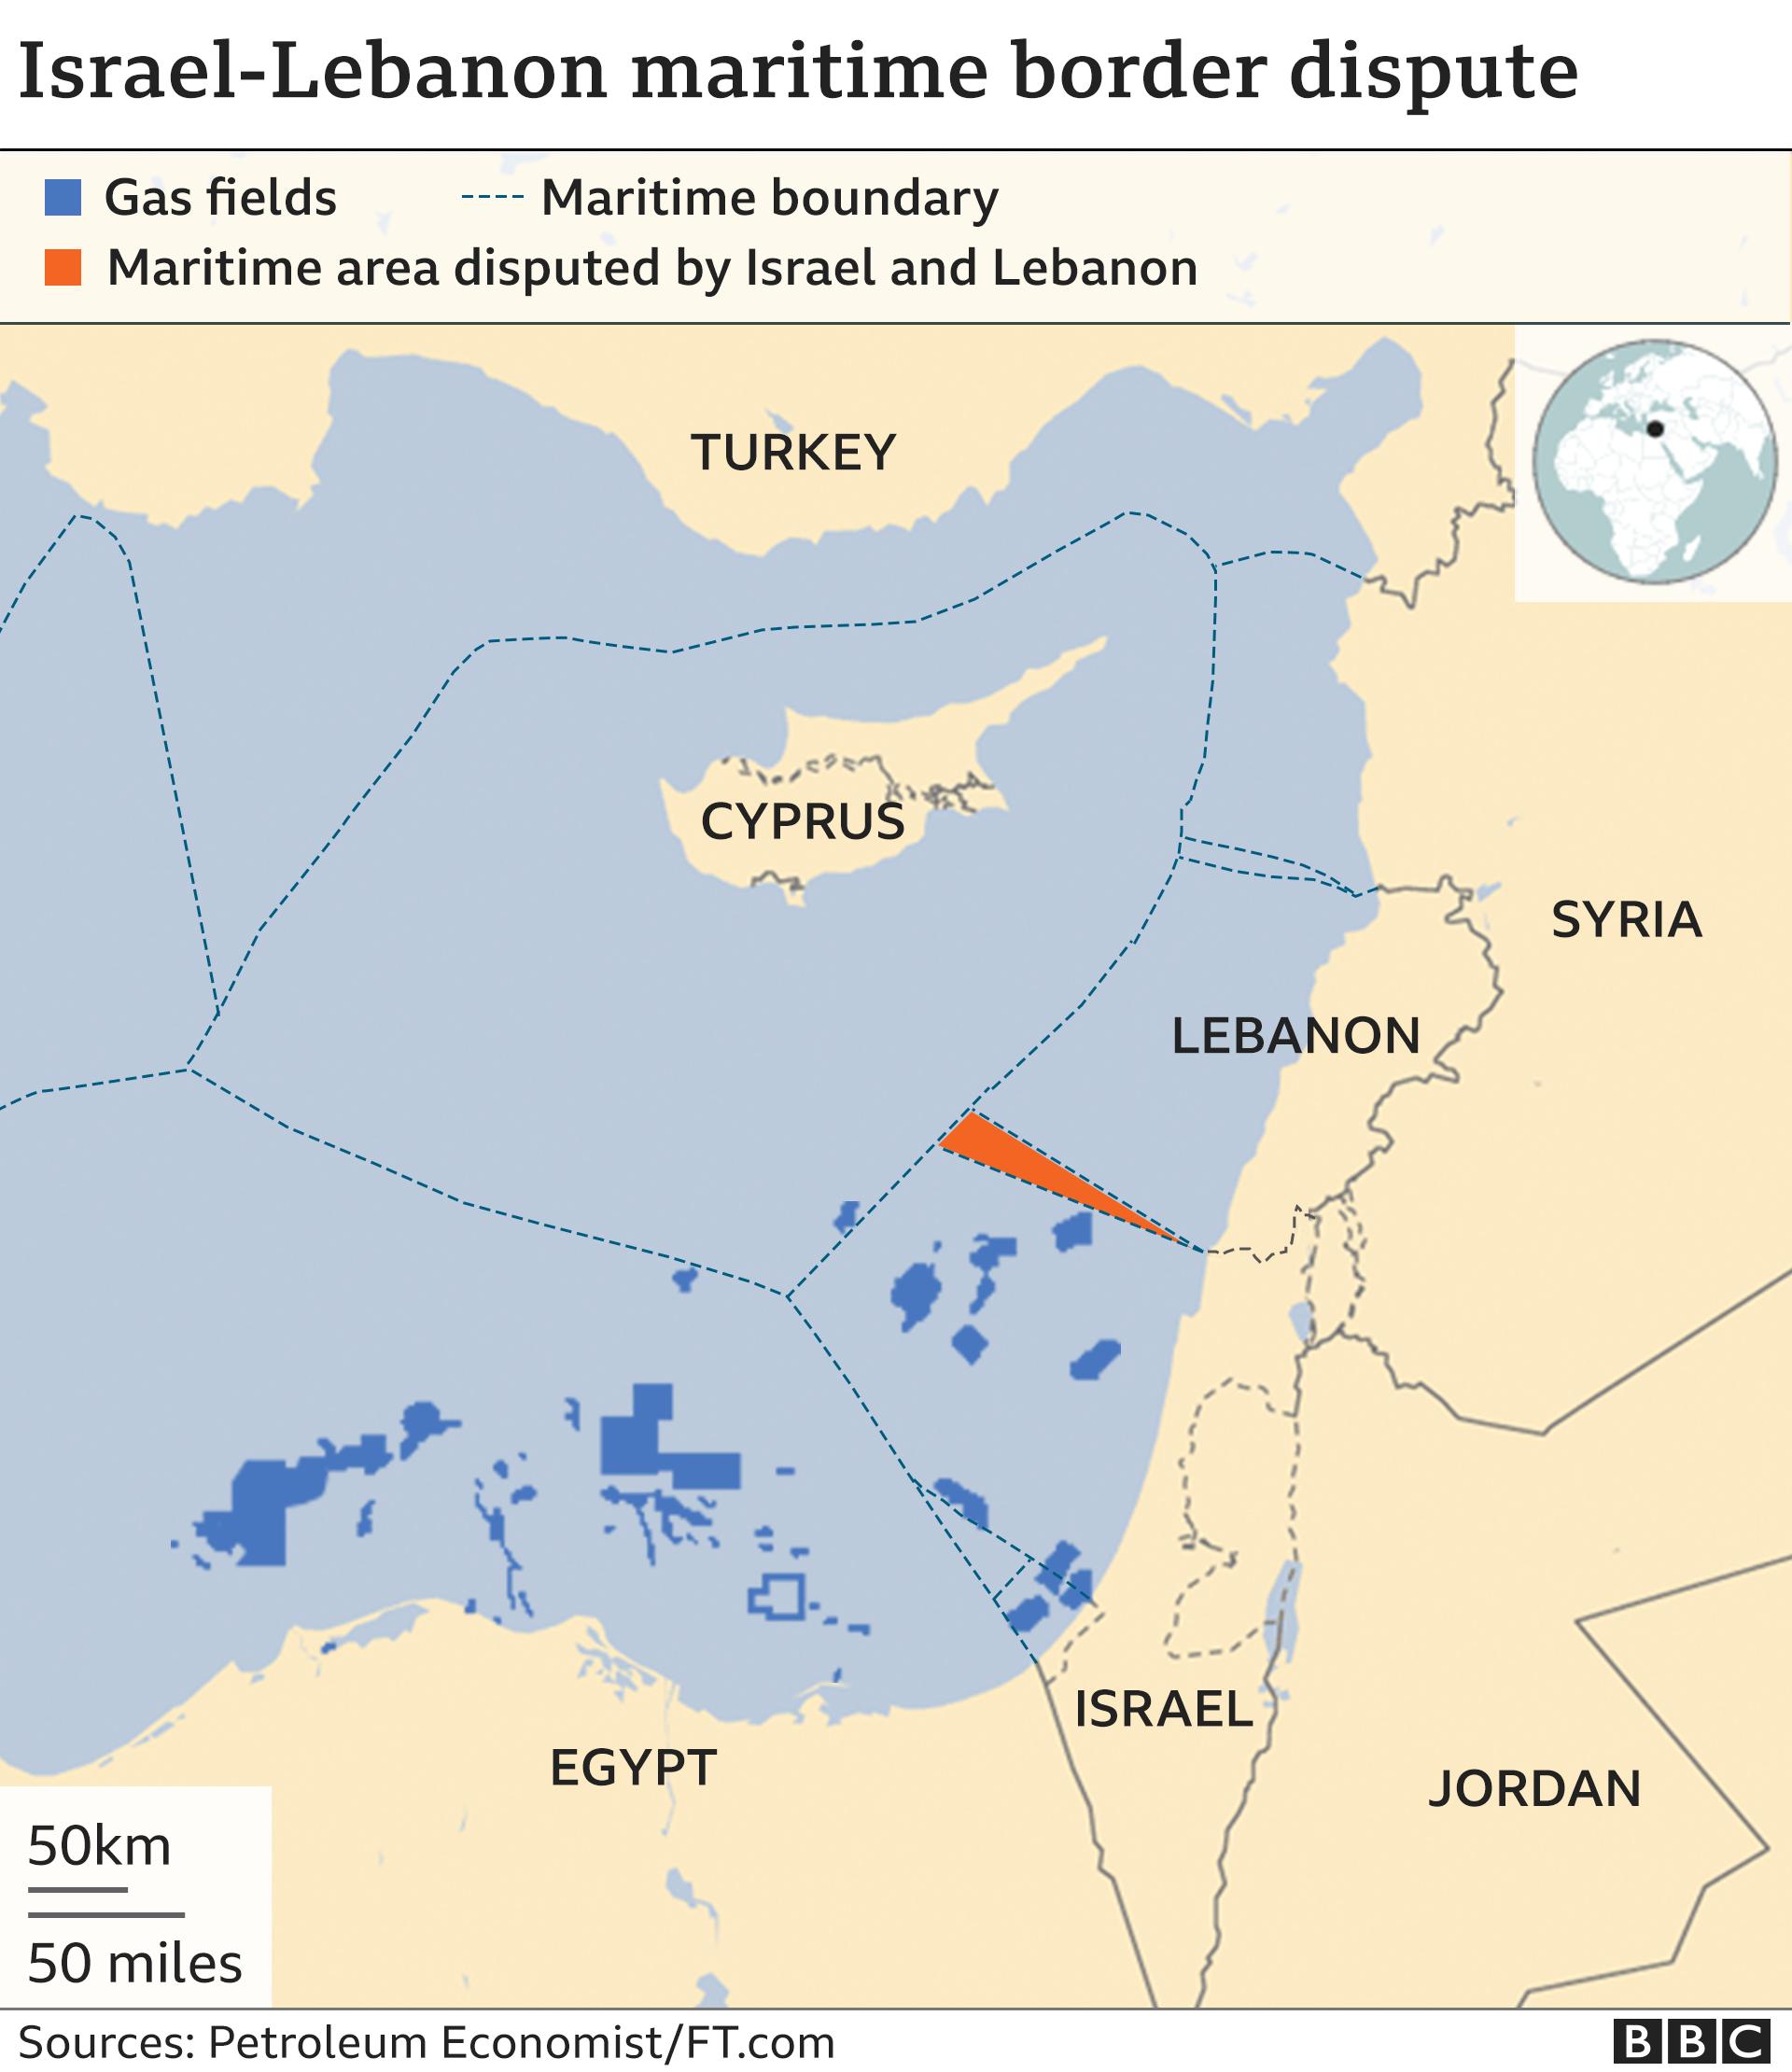 Map showing Israel-Lebanon maritime border dispute